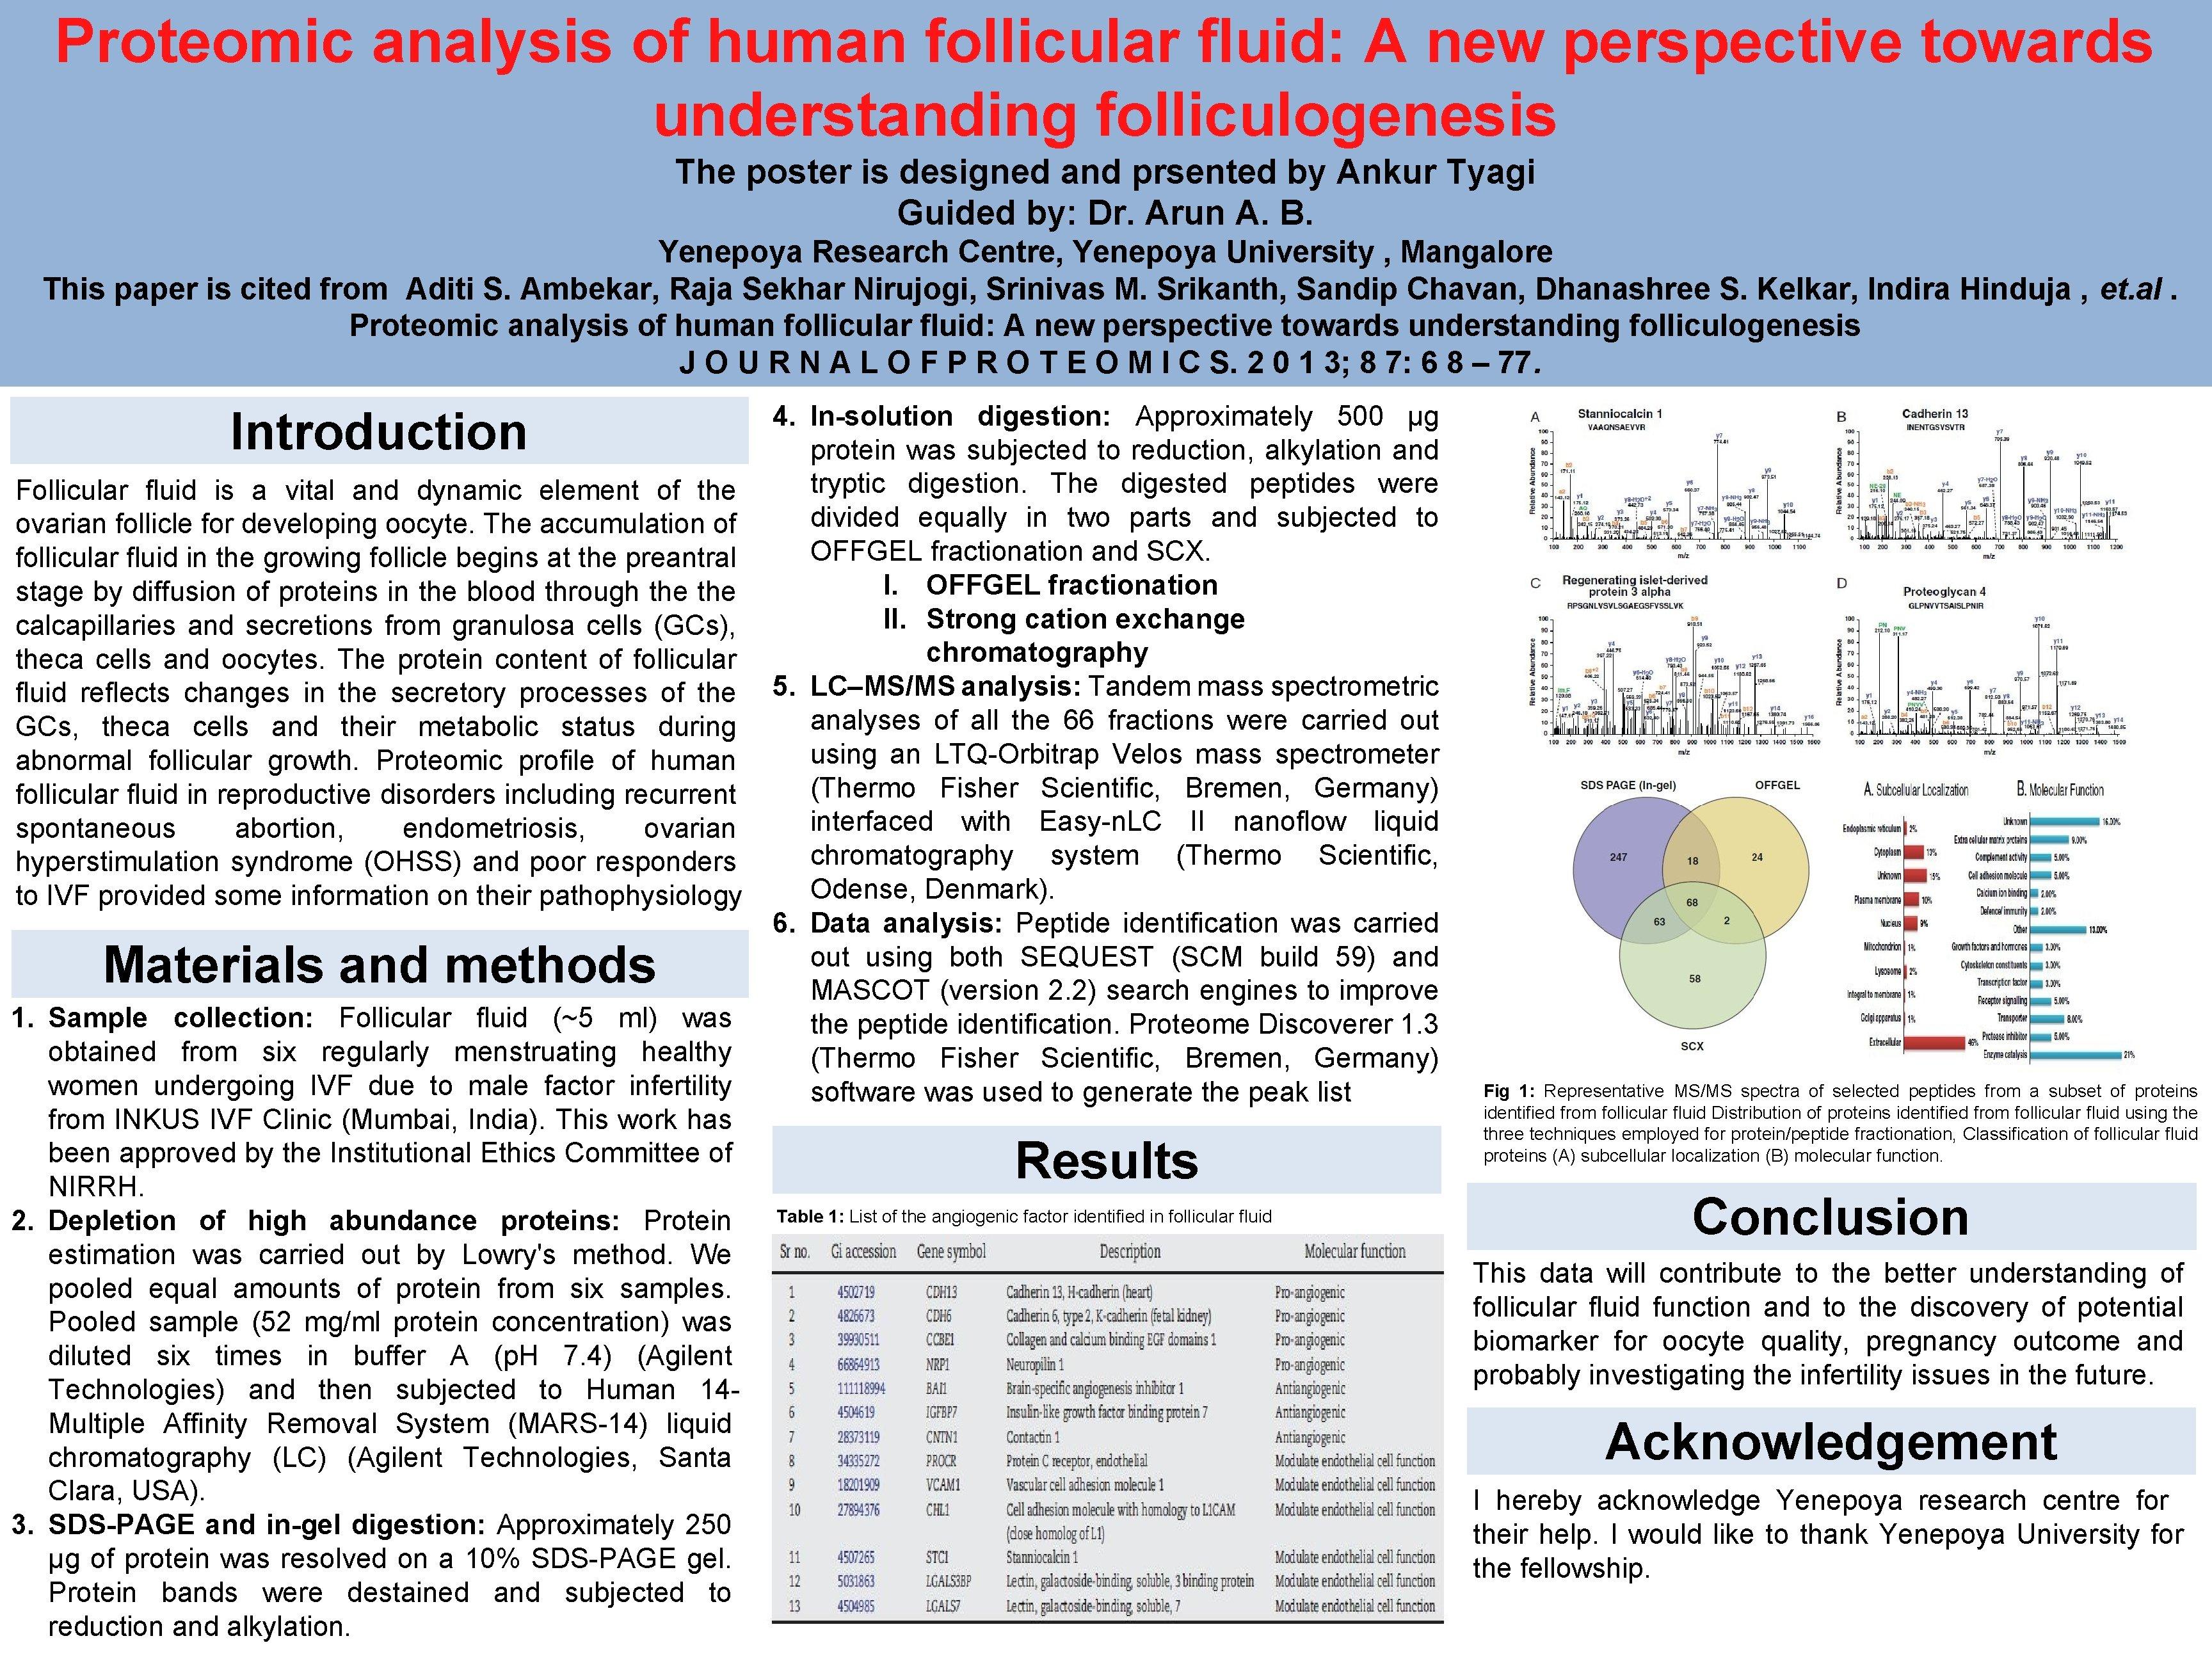 Proteomic analysis of human follicular fluid: A new perspective towards understanding folliculogenesis The poster